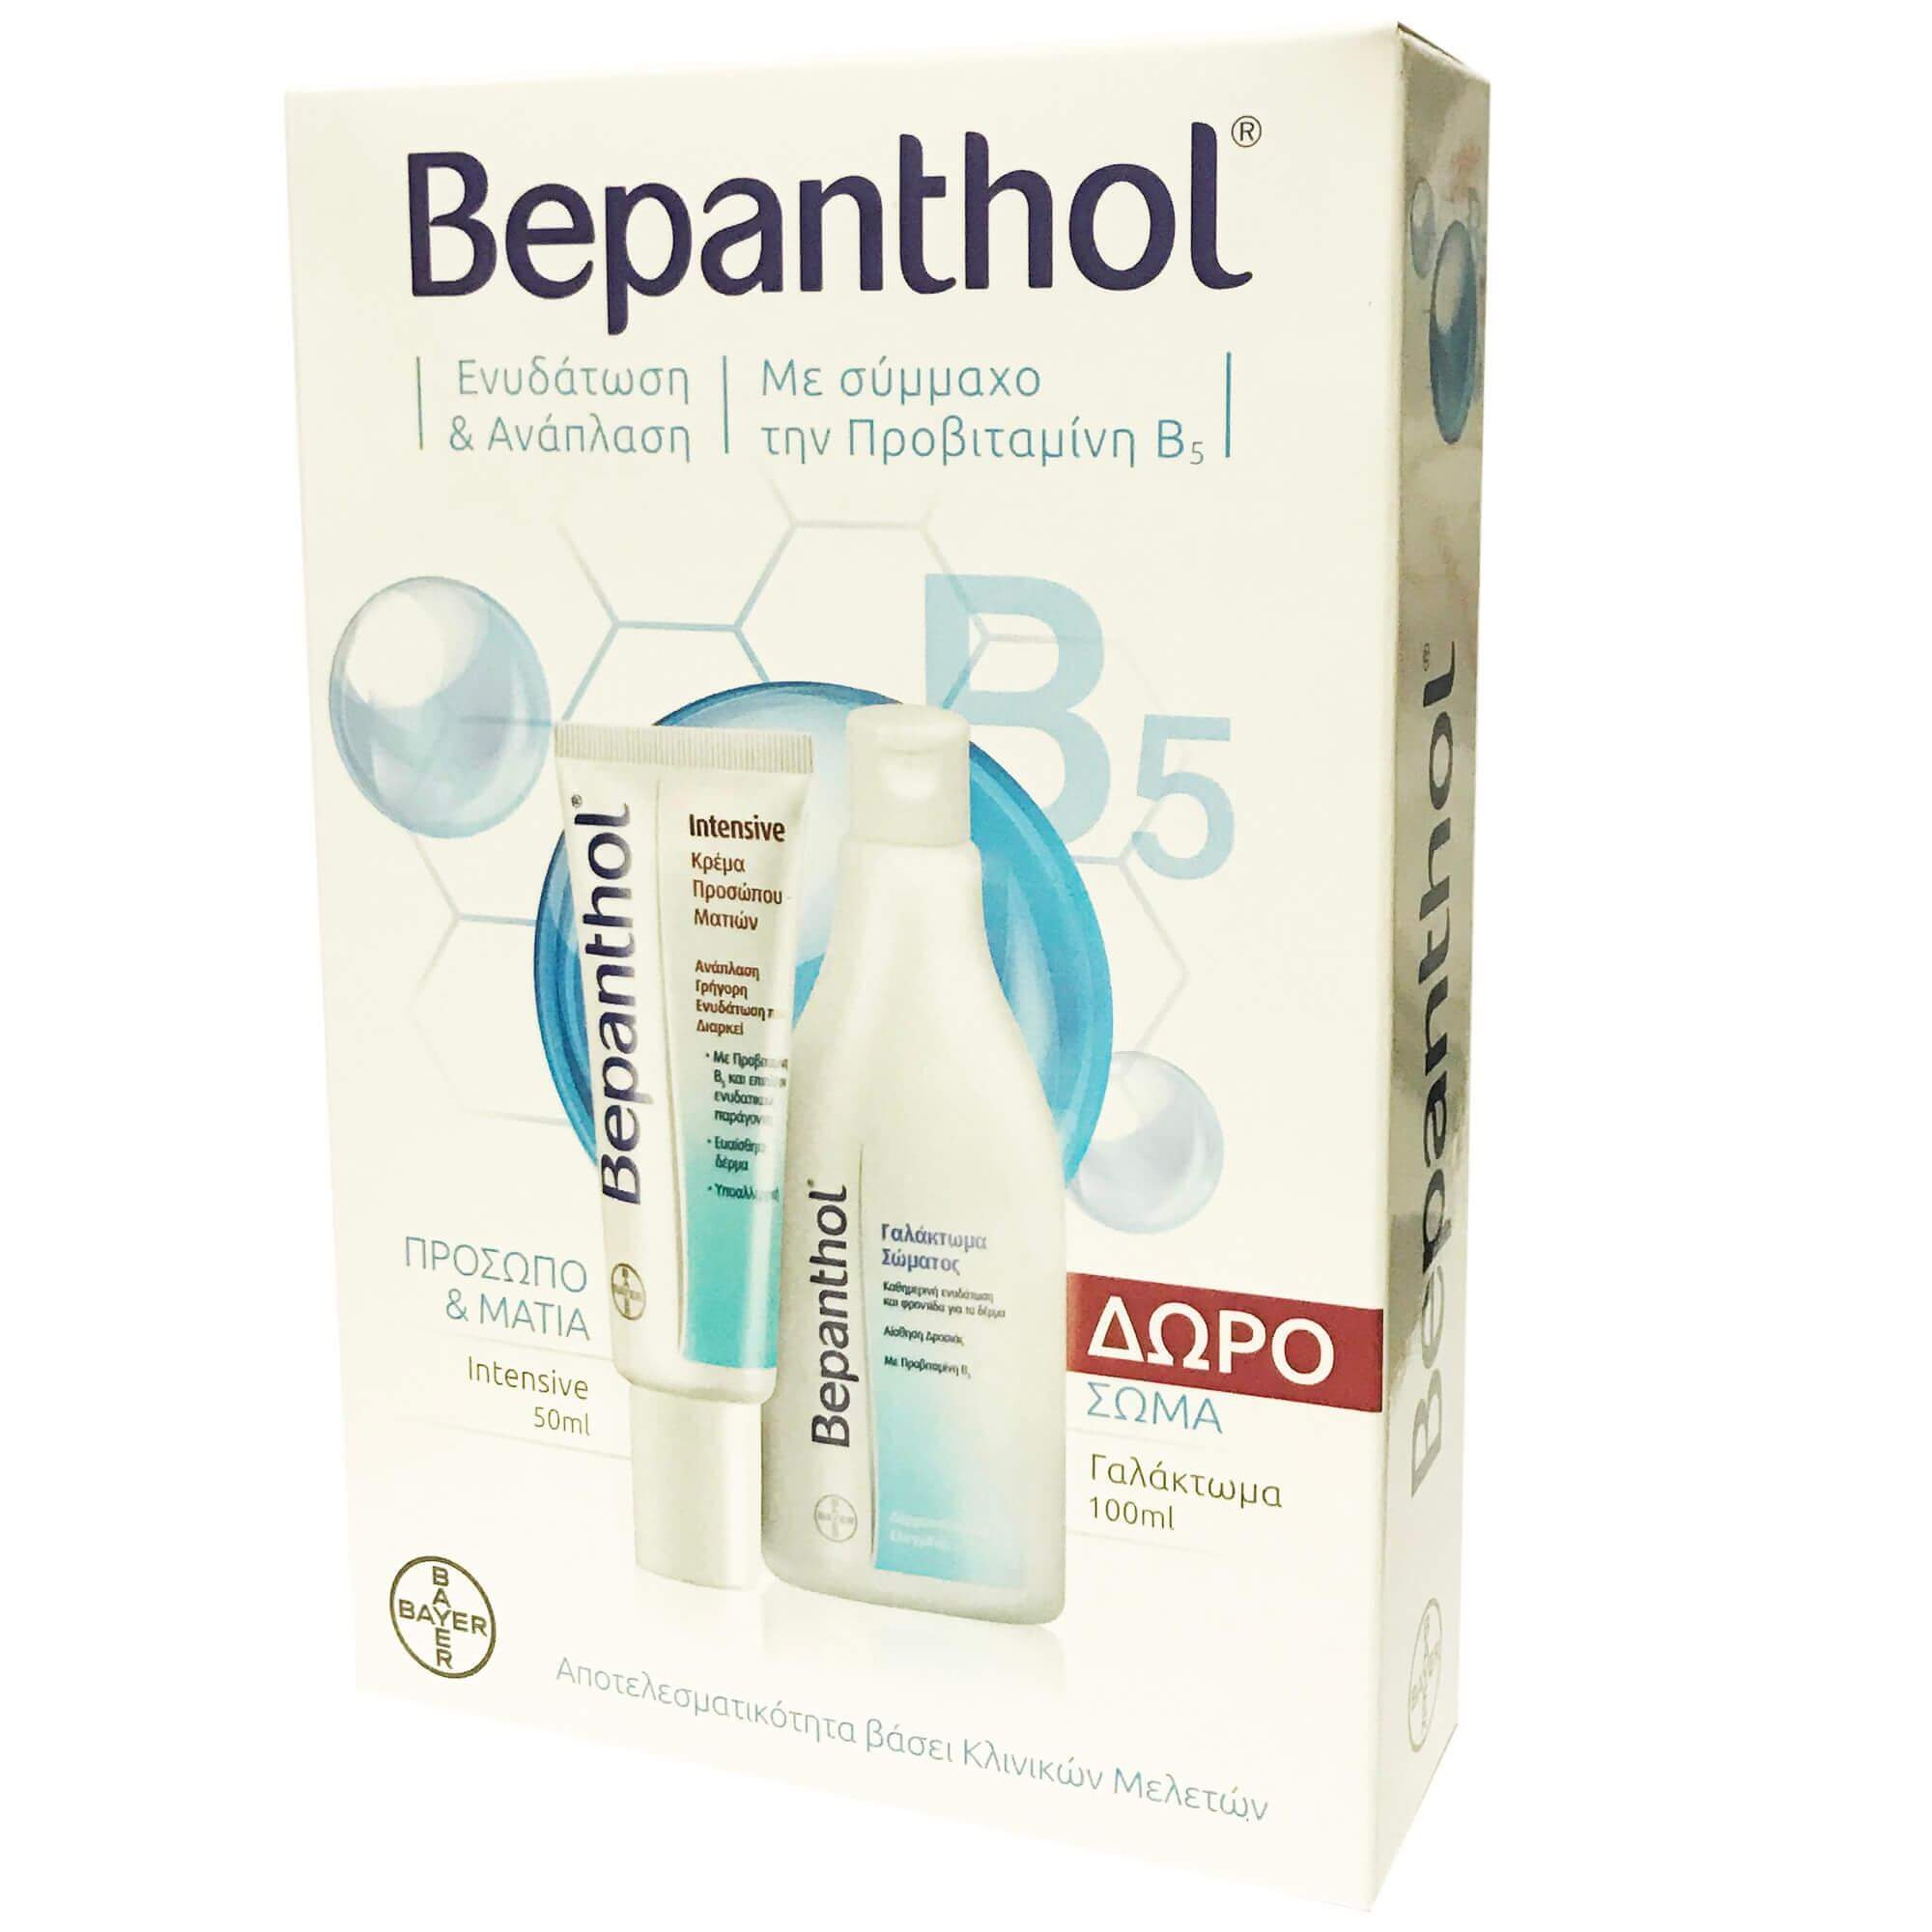 Bepanthol Intensive Face Eye Cream Κρέμα Προσώπου Ματιών 50ml & Δώρο Bepanthol Γ υγιεινή   σώμα   ενυδάτωση σώματος